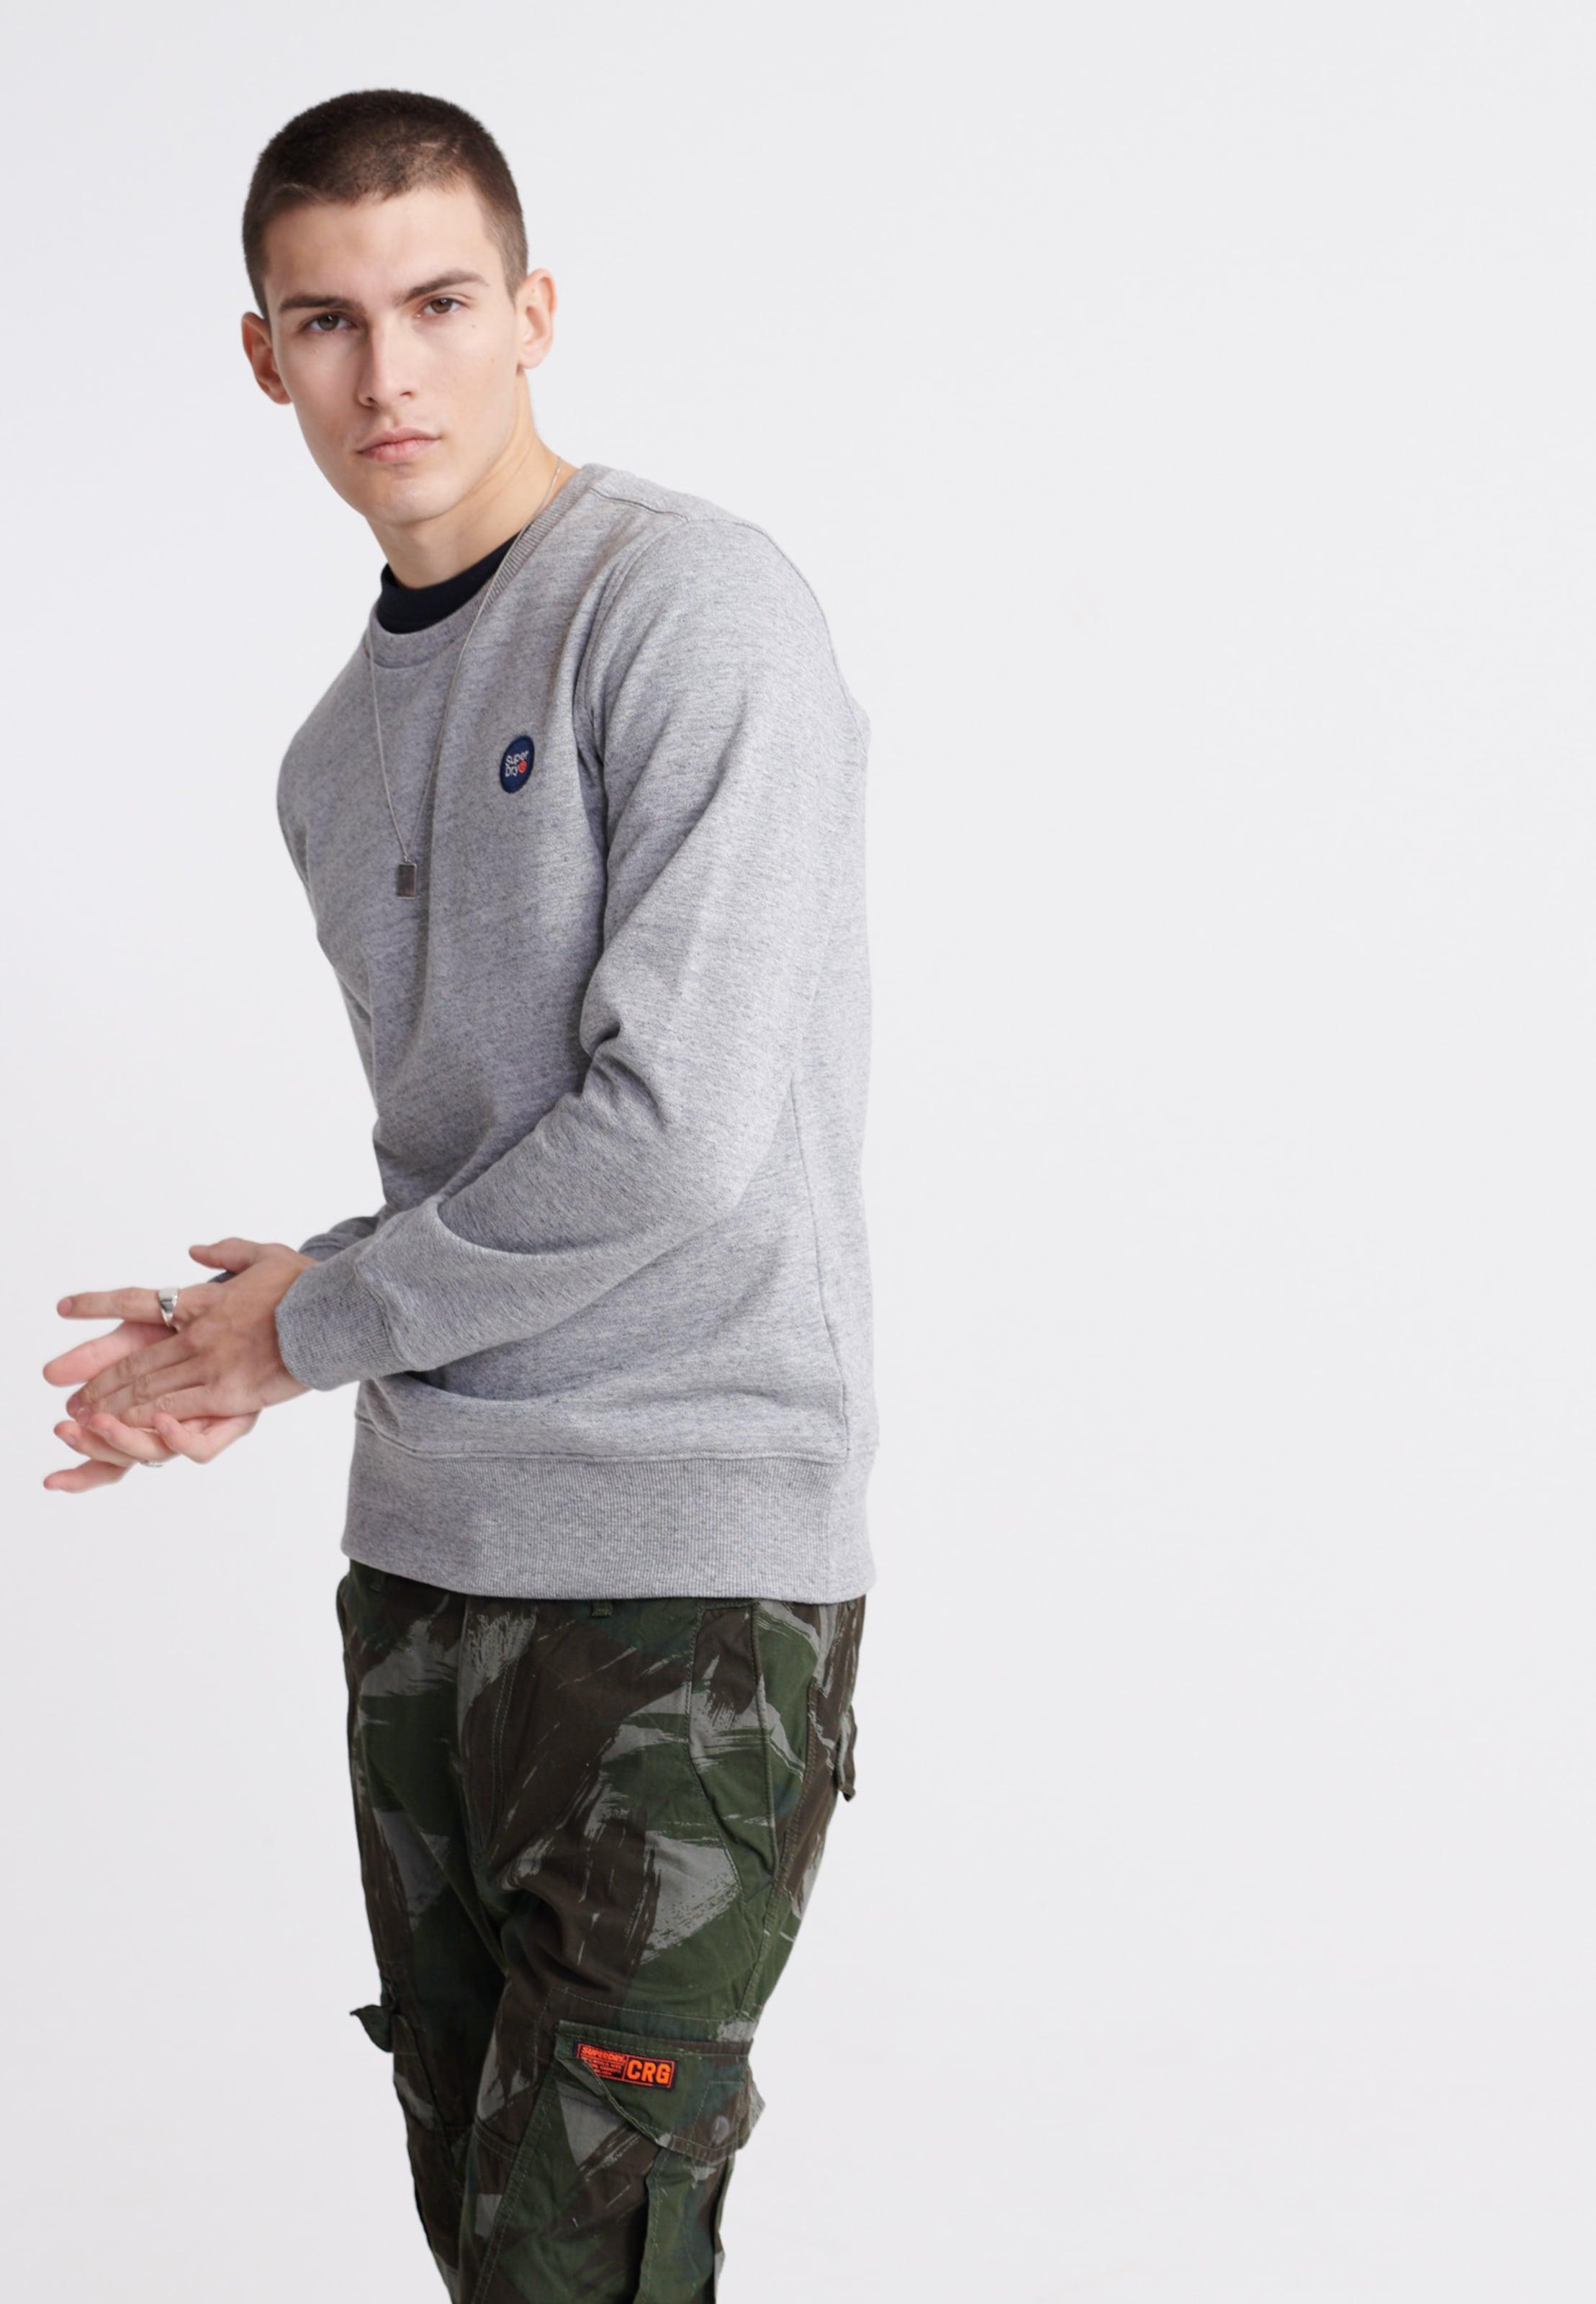 Superdry Sweatshirt in graumeliert Sweatstoff 10406075003429SS006